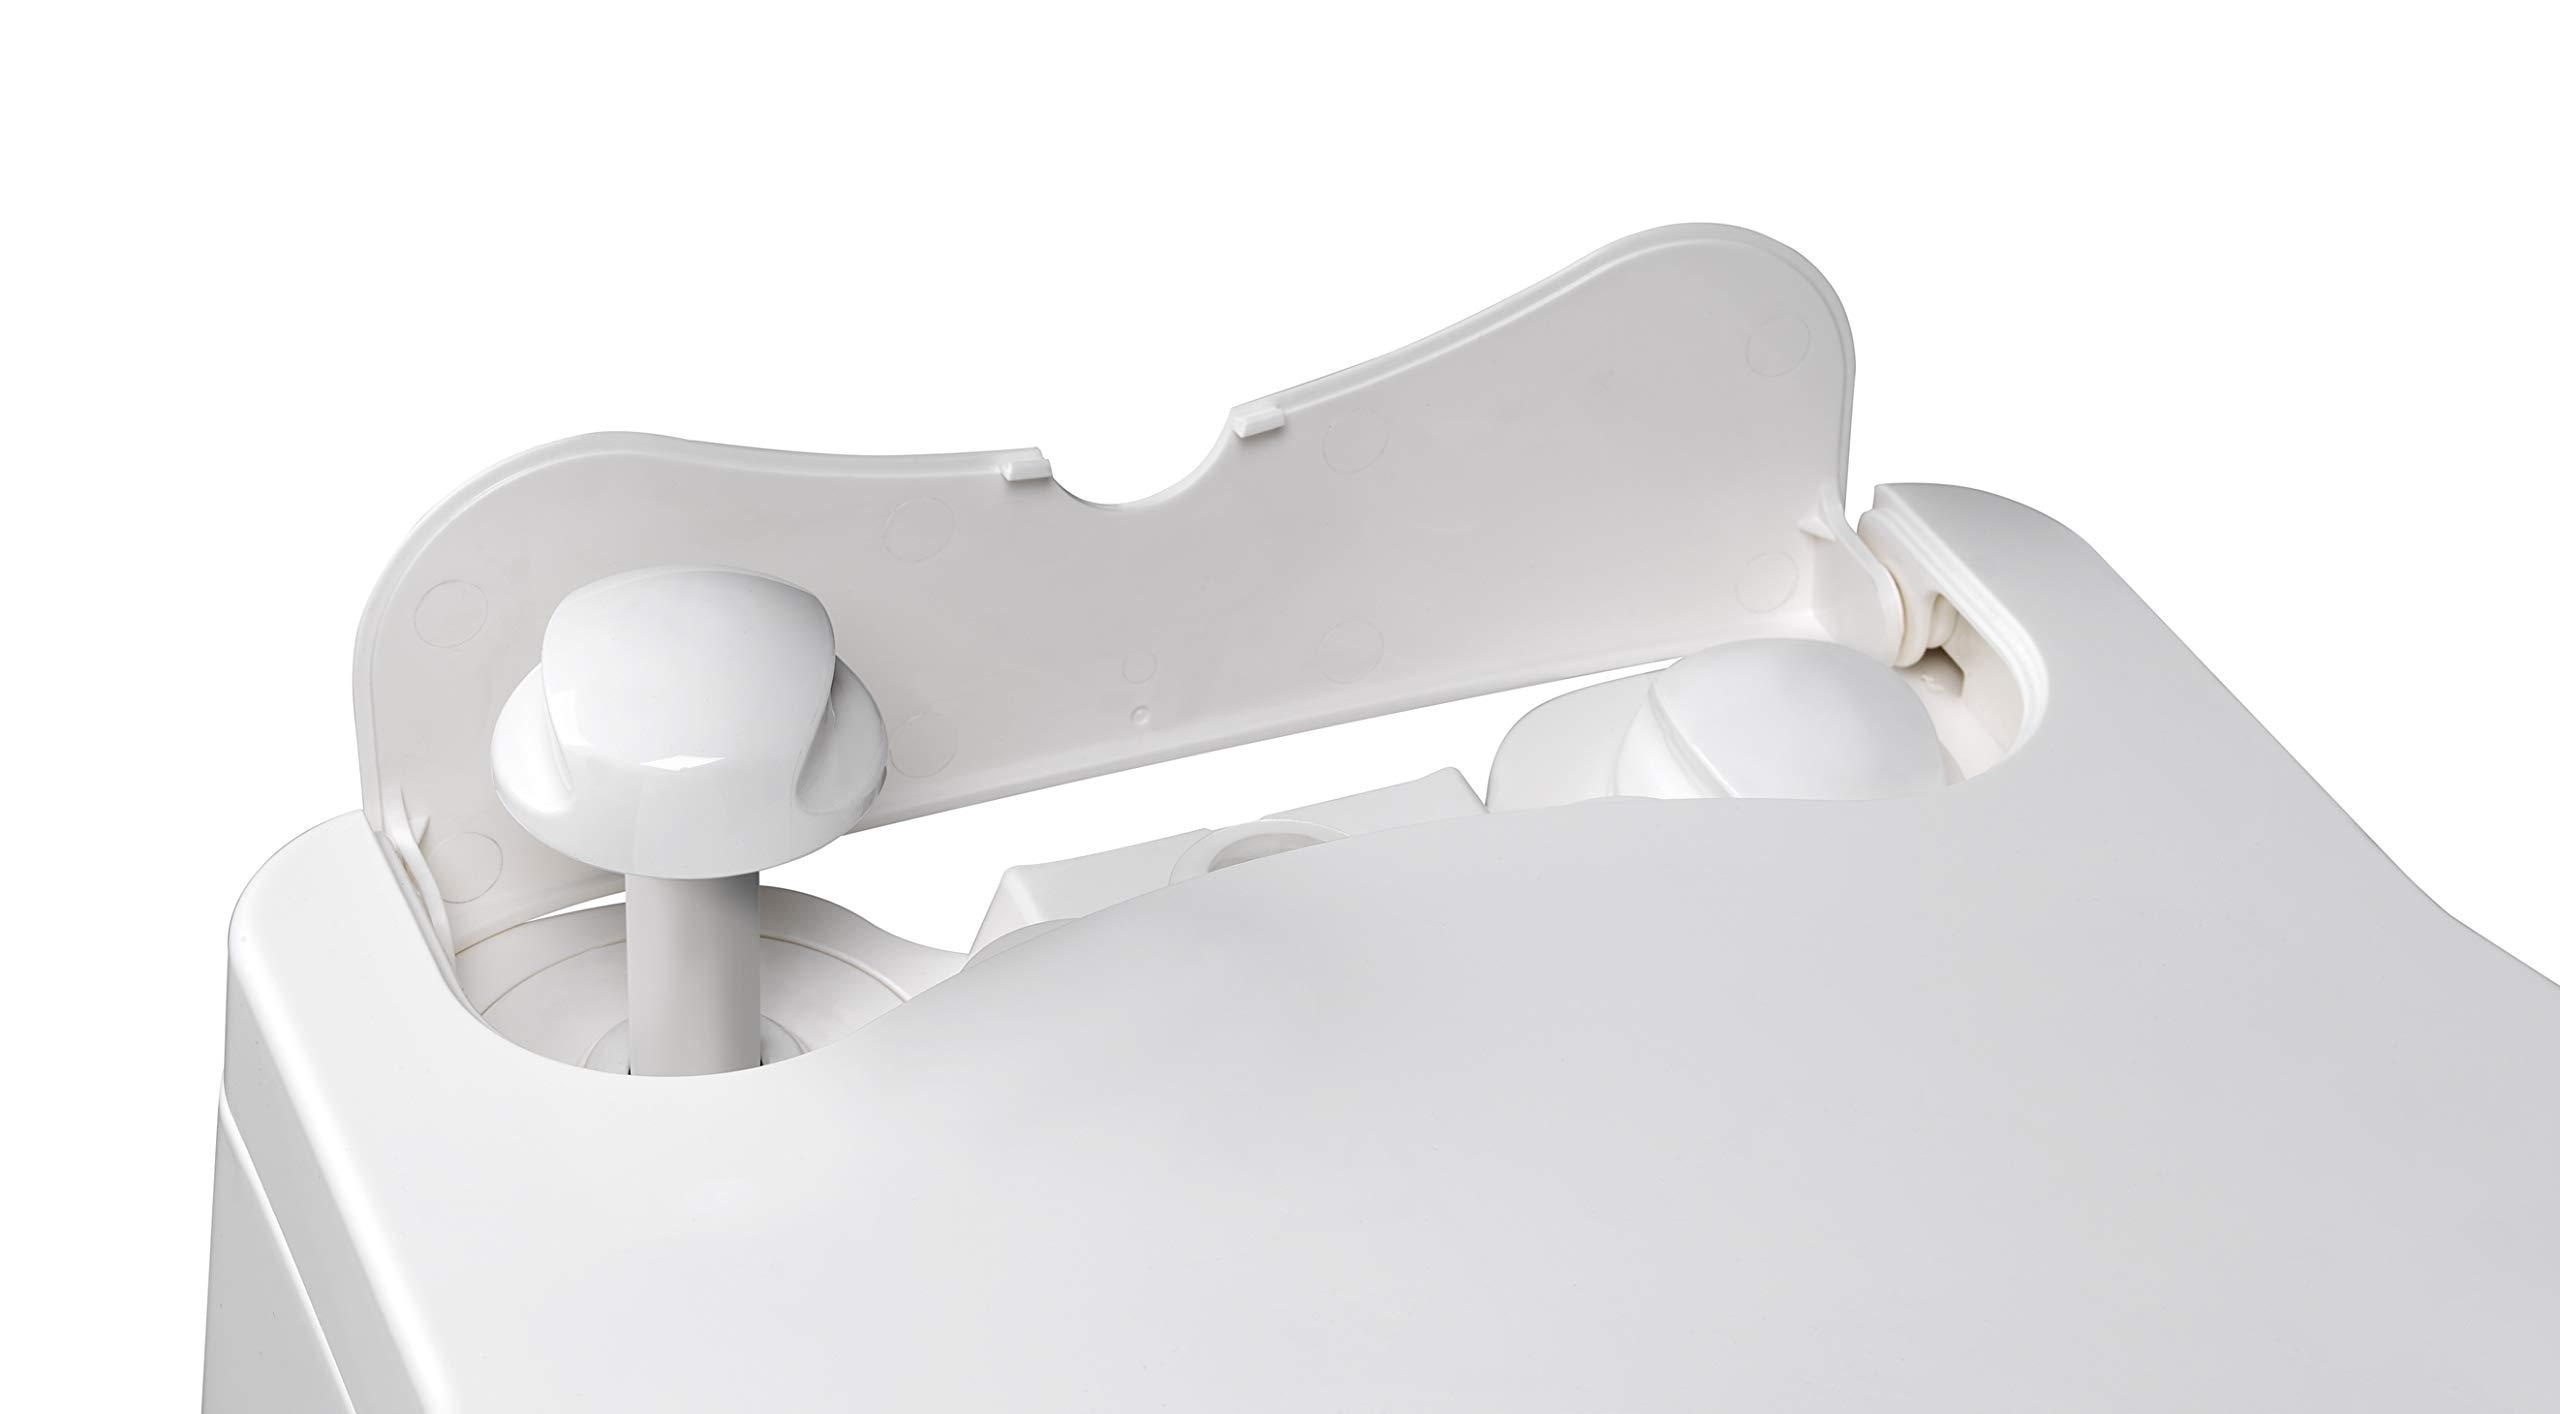 Thetford 92305 Porta Potti 565P Excellence Portable Toilet (Manual), 448 x 388 x 450 mm 11